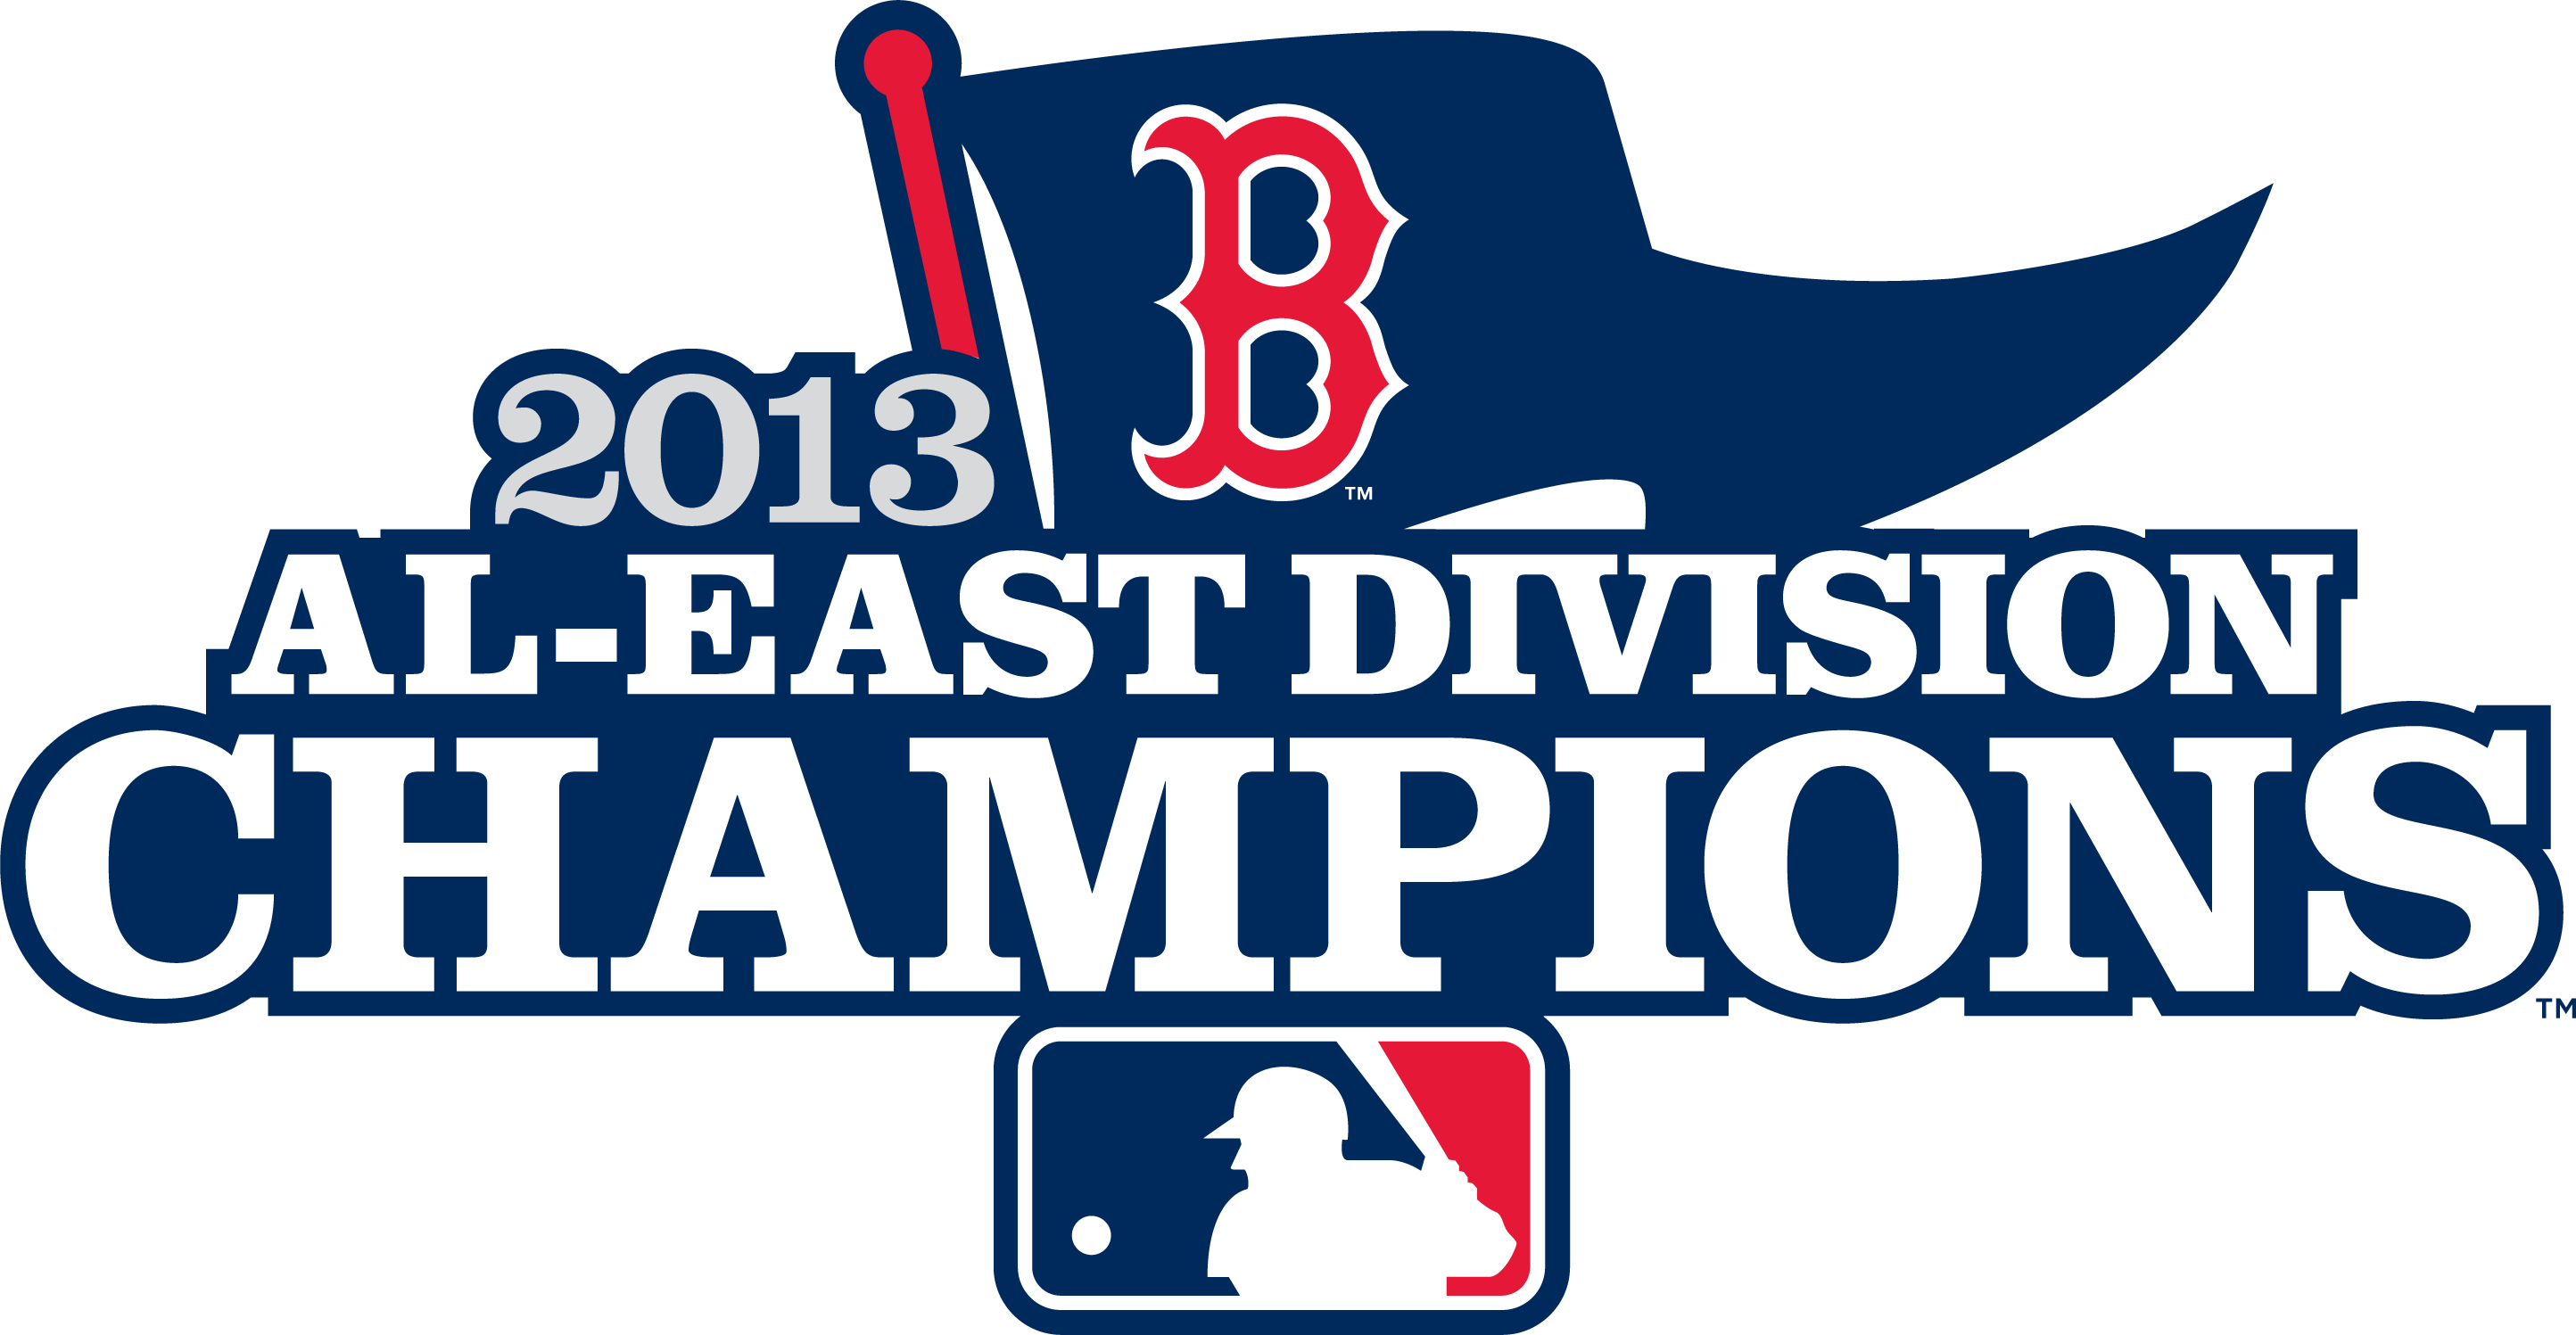 Boston Red Sox Logo Champion Logo (2013) - Boston Red Sox 2013 AL East Division Champions logo SportsLogos.Net